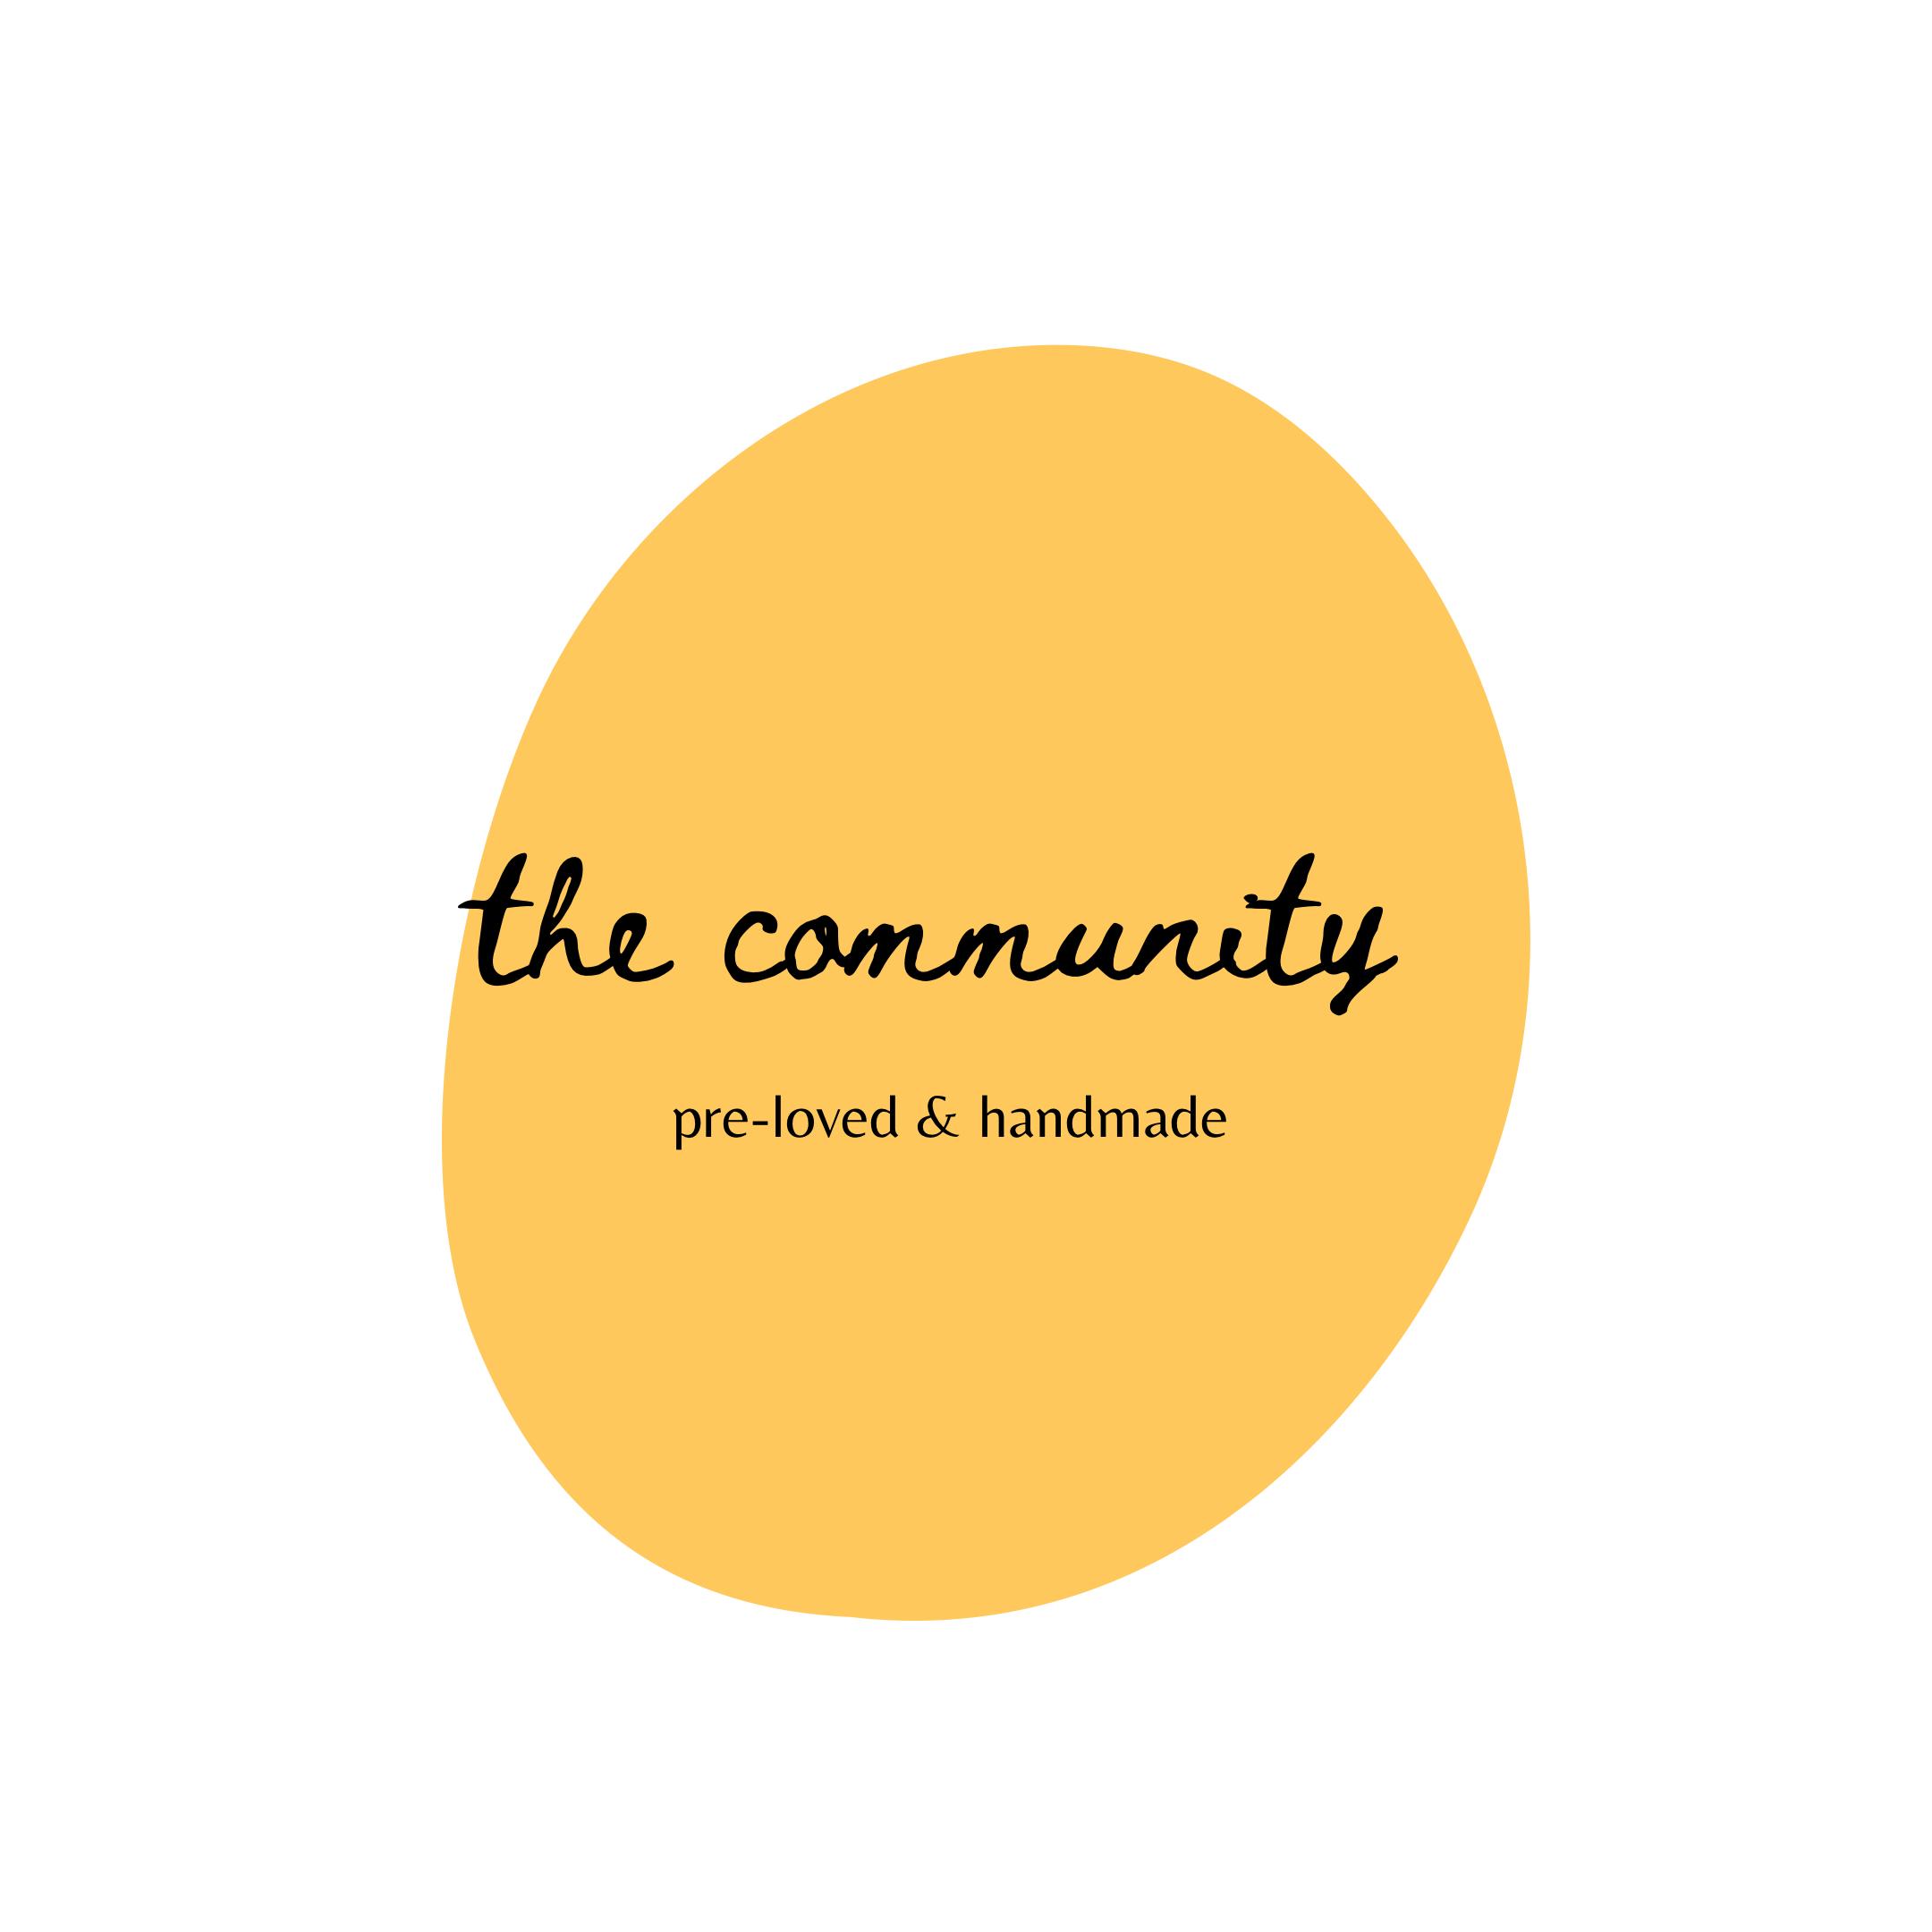 The Community logo